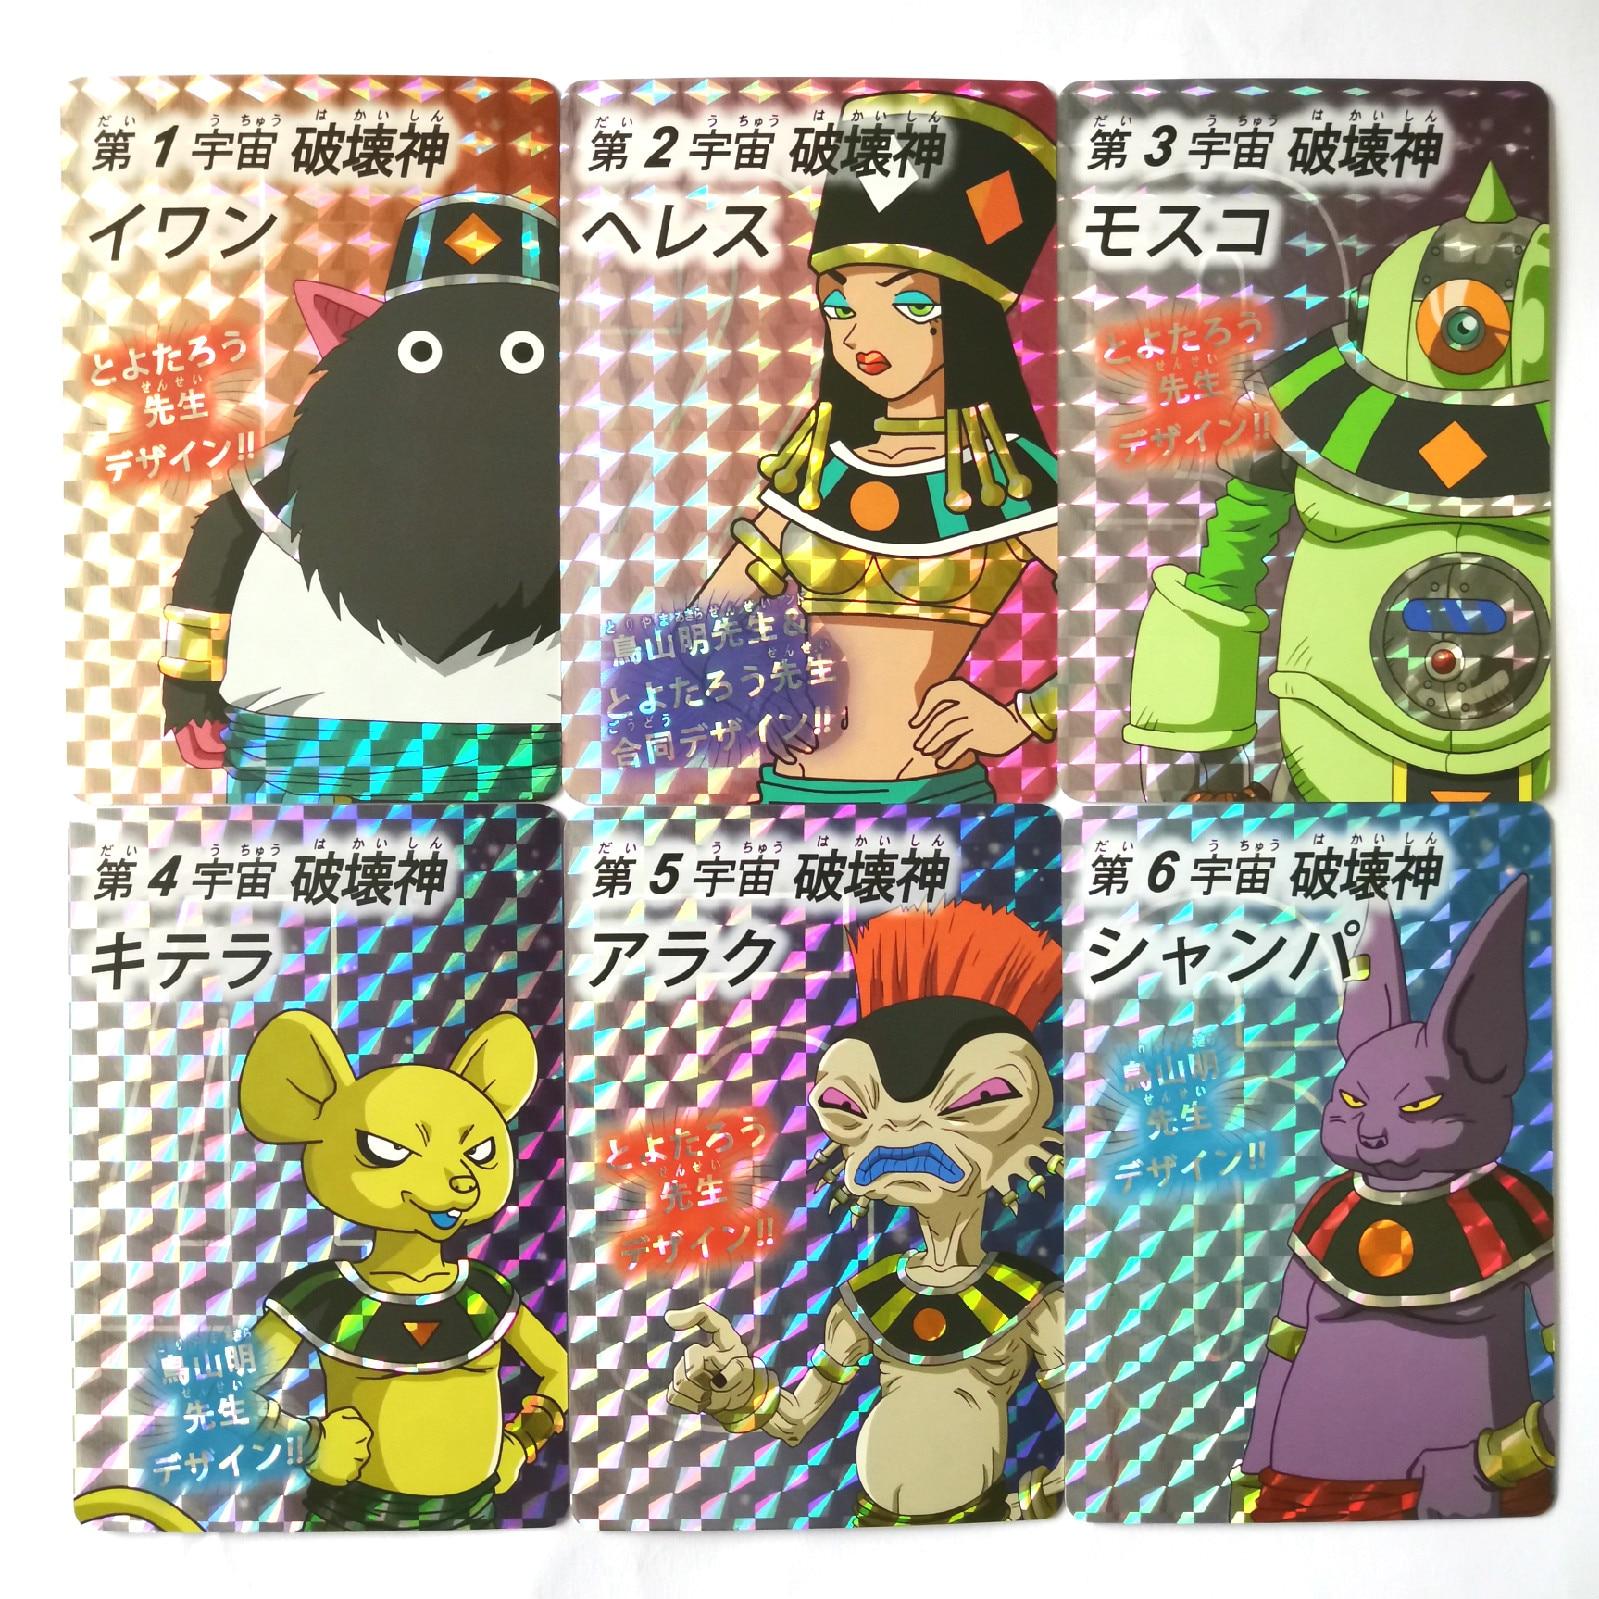 Dragon Ball Super Ultra Gods Of Destruction Instinct Limit Action Figures Commemorative Edition Game Flash Card Collection Cards